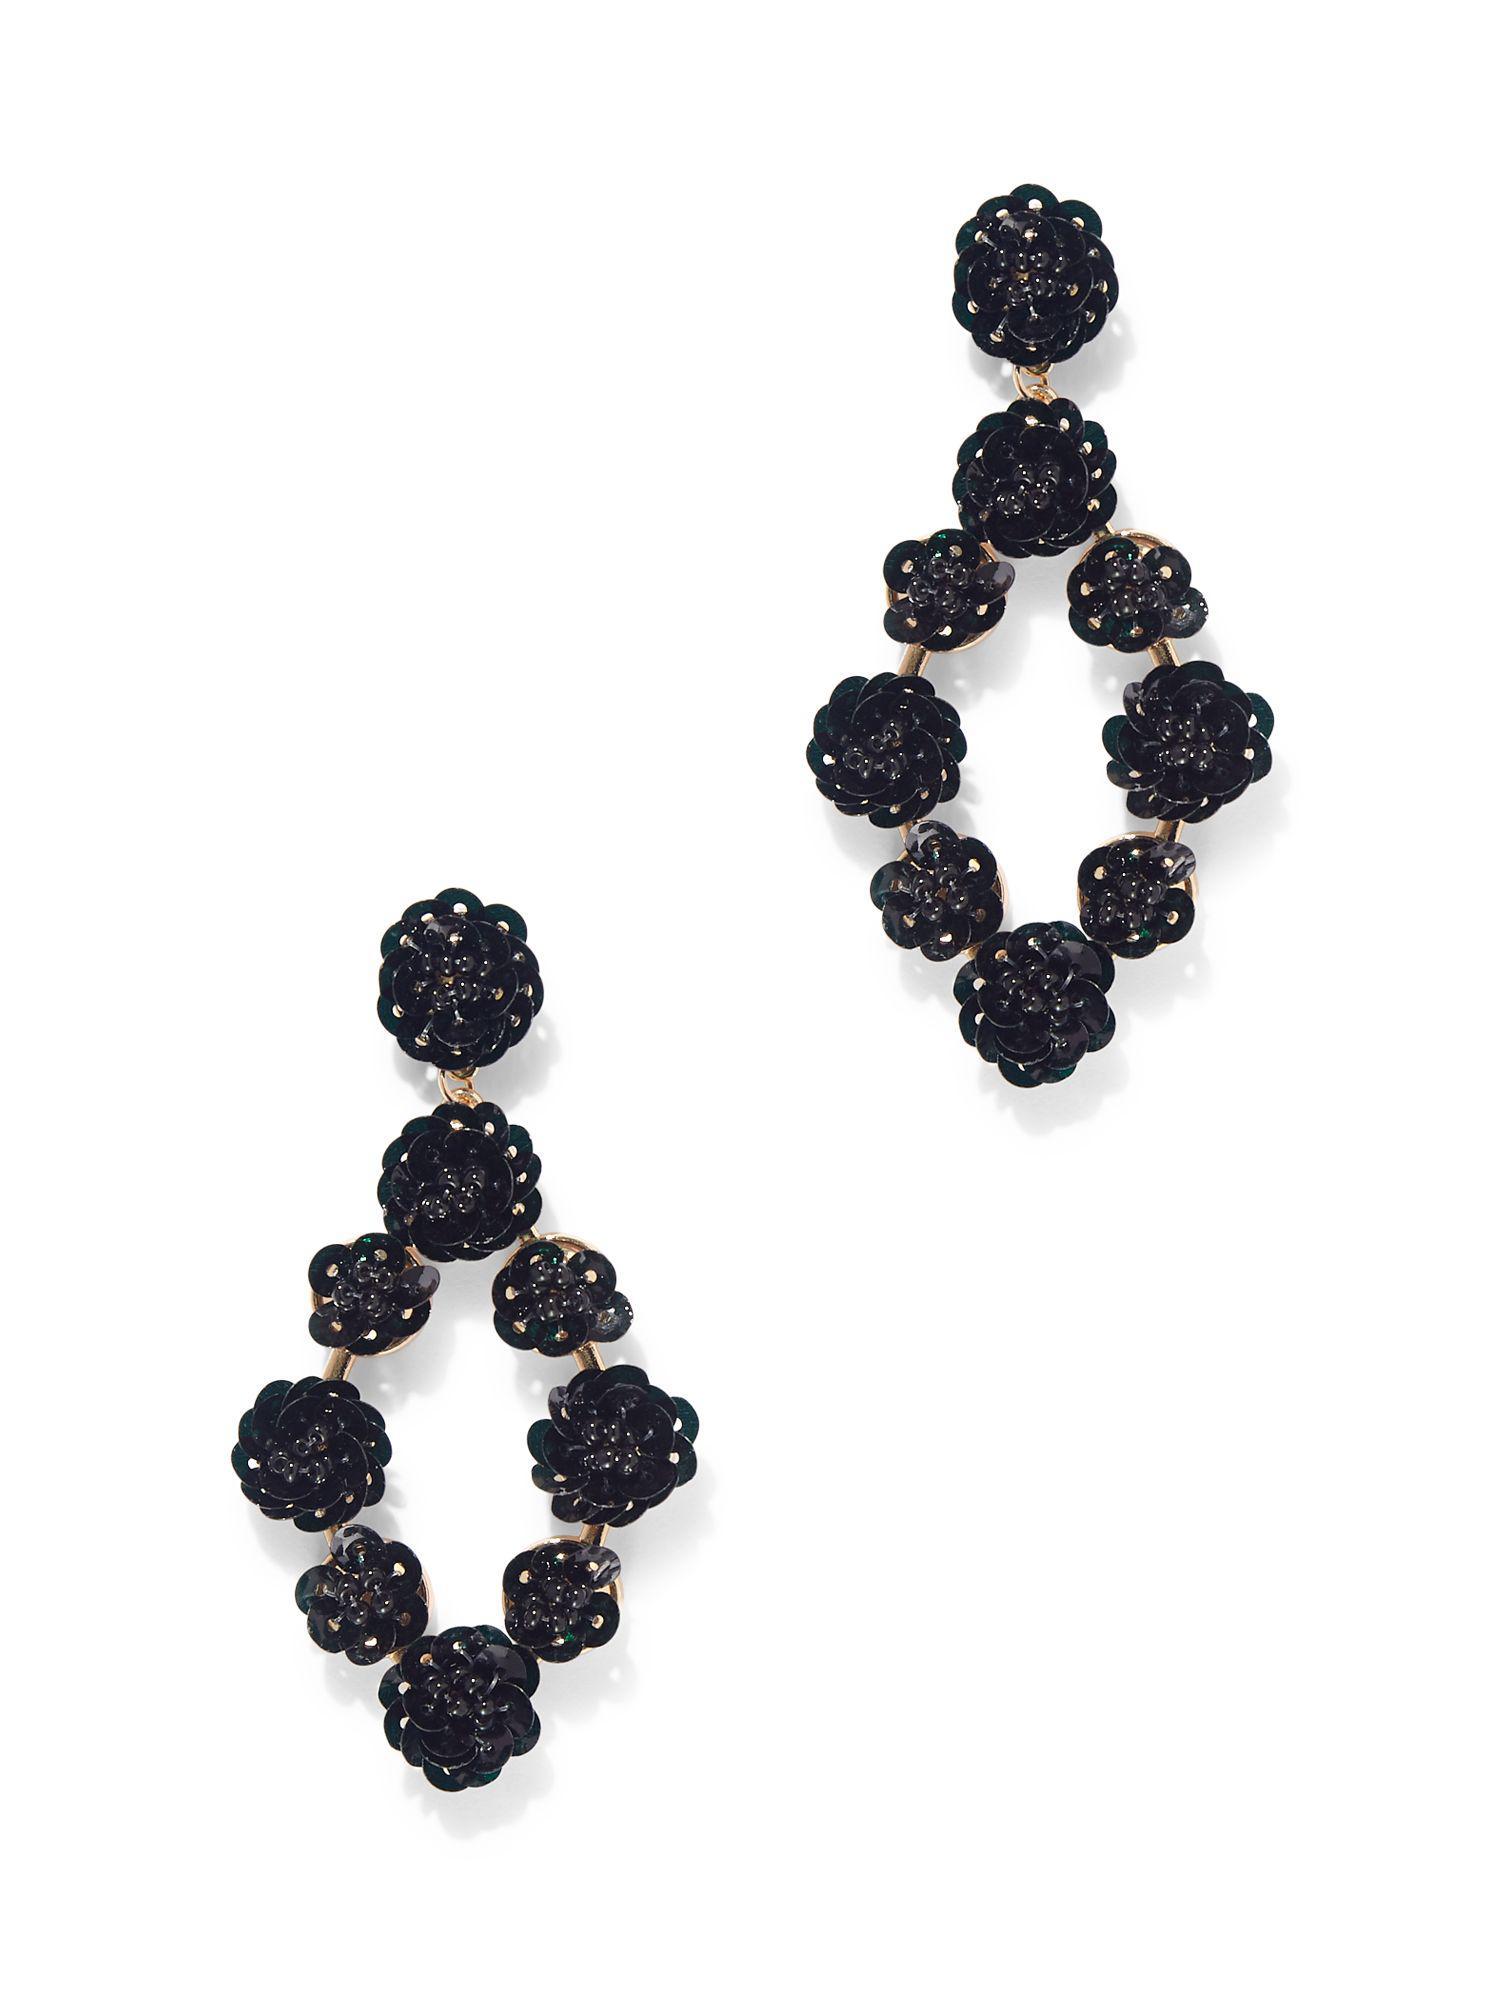 441388a95 Lyst - New York & Company Dazzling Drop Earring in Black